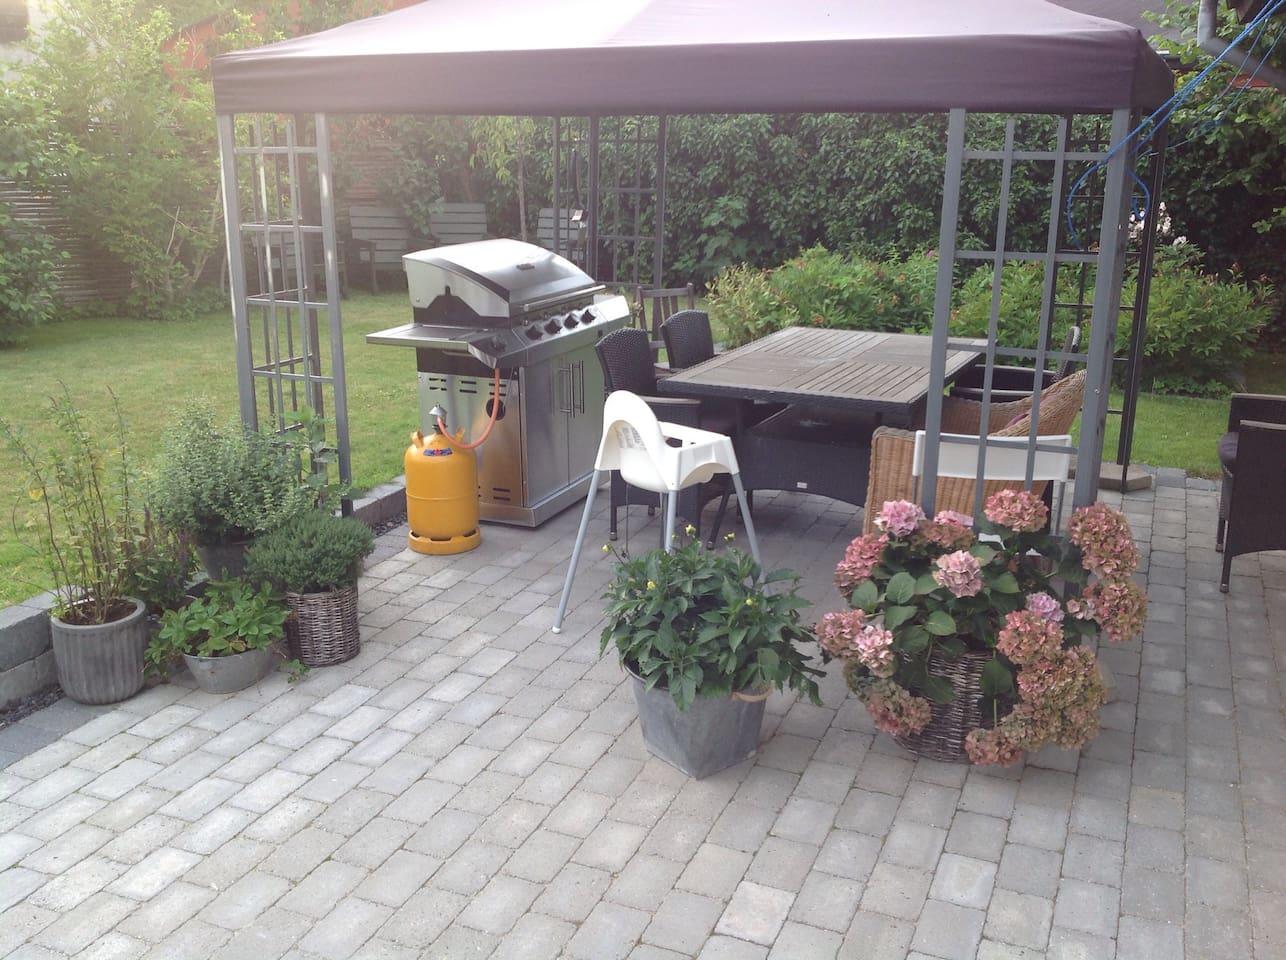 Main terrace and garden